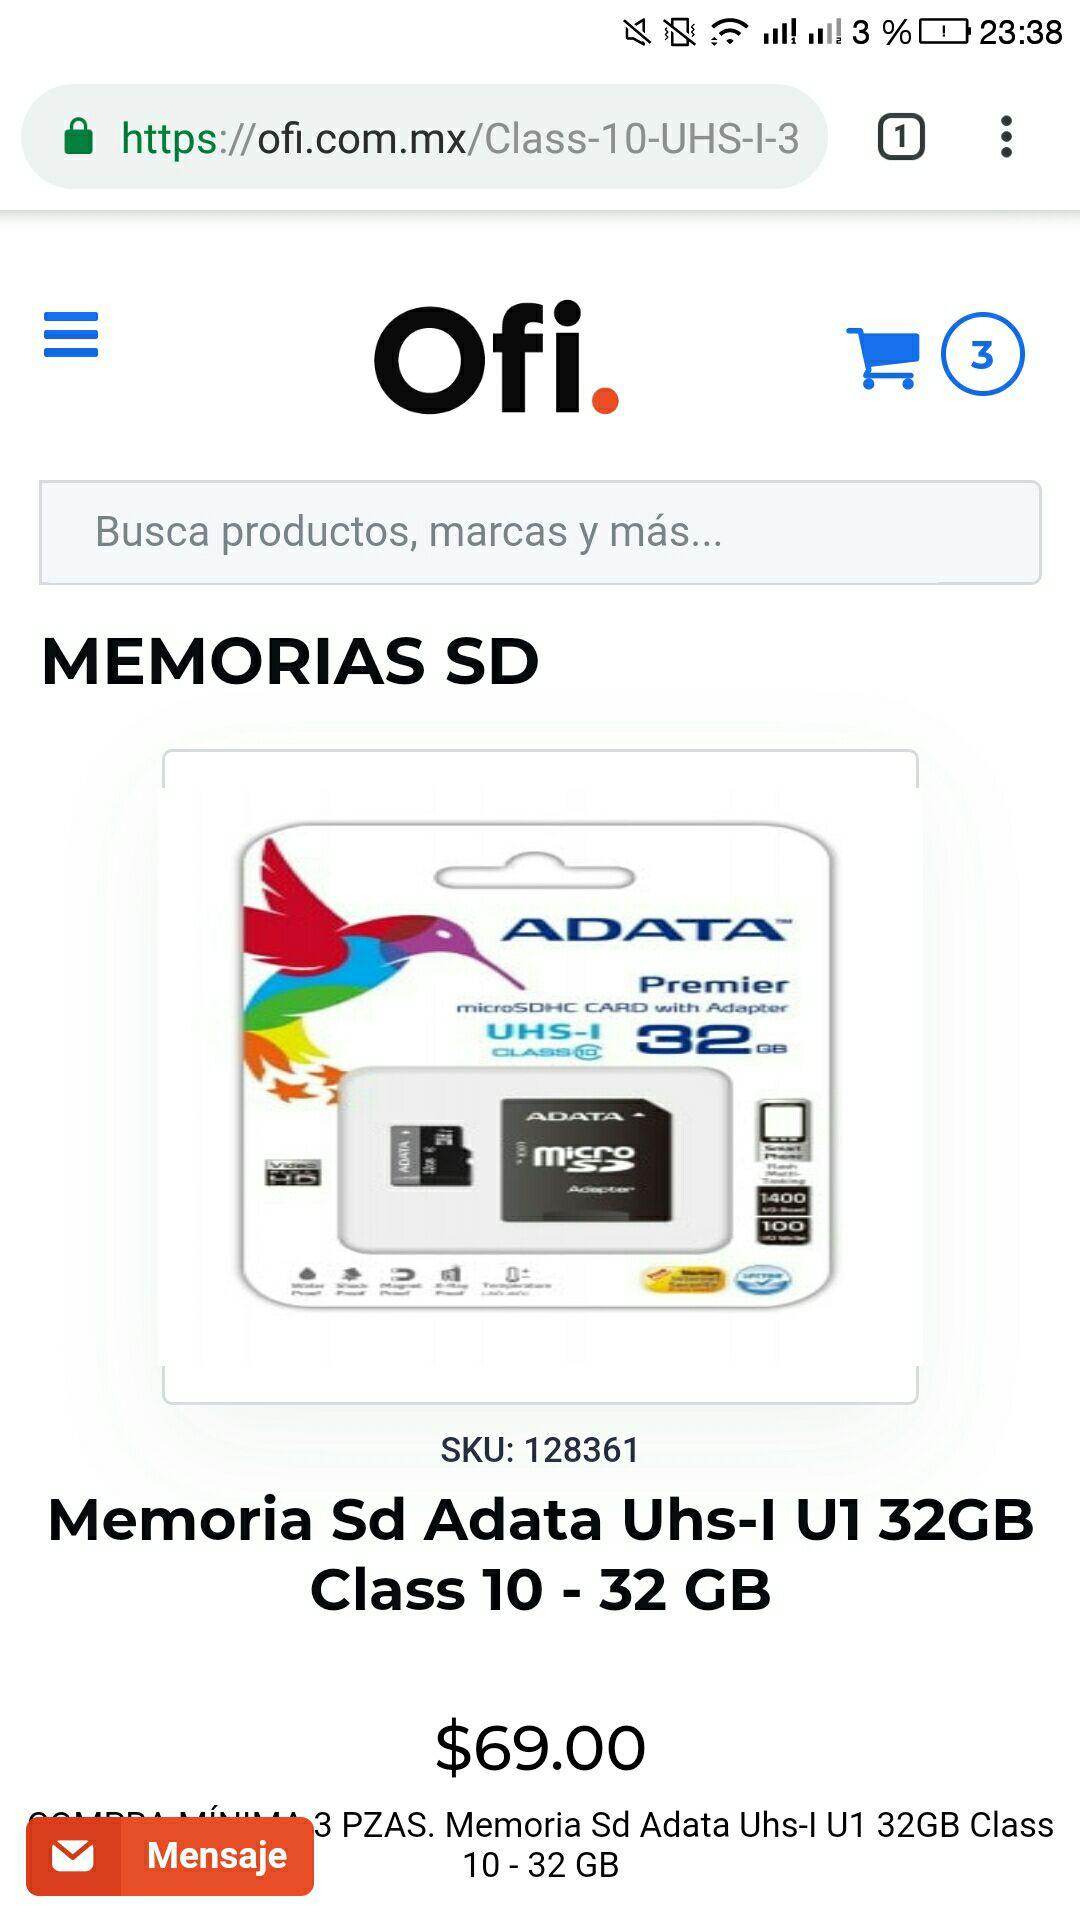 Ofi: Memoria Micro SD de 32 GB Adata Clase 10 UHS-1 con envío gratis (Compra mínima de 3 unidades)